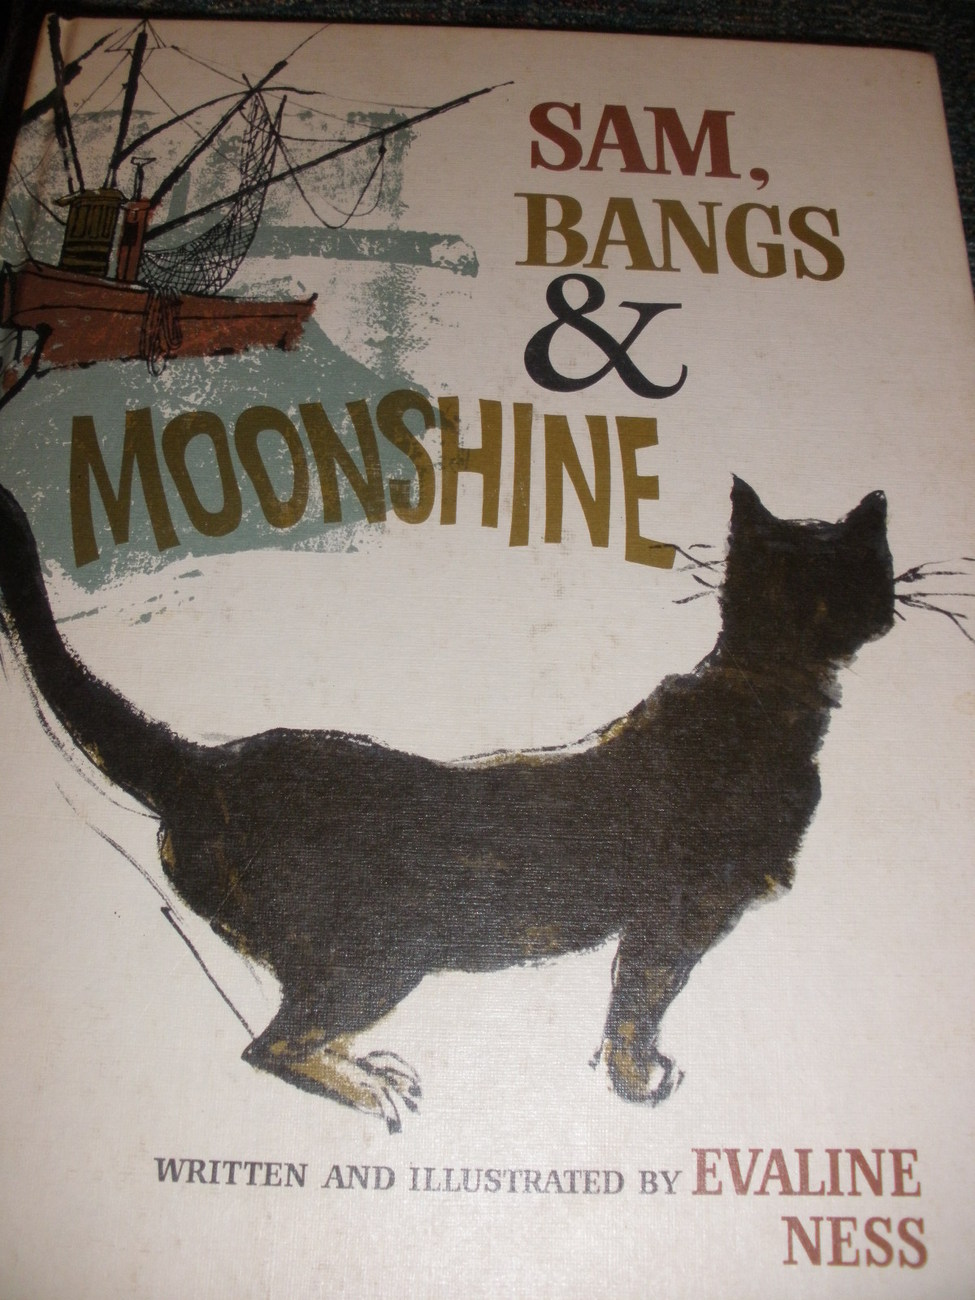 SAm, Bangs and Moonshine children's book by Evaline Ness